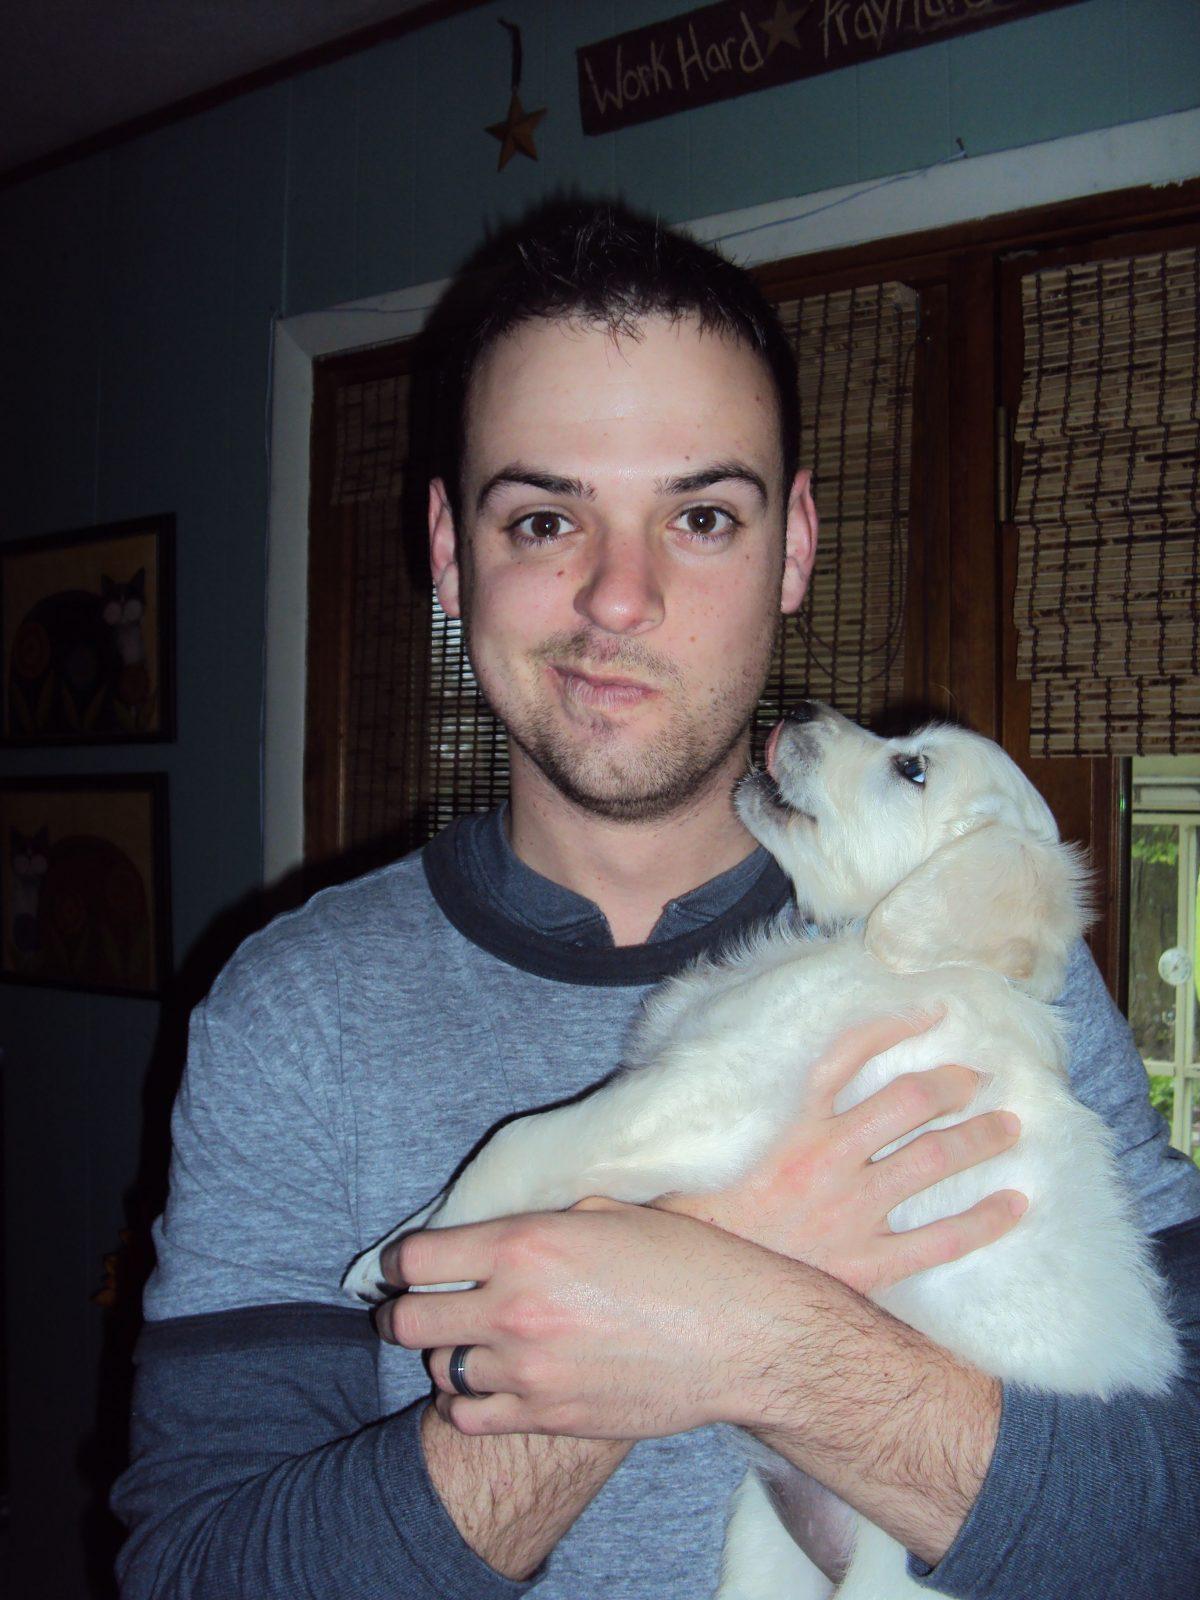 lg Me Paisley puppy